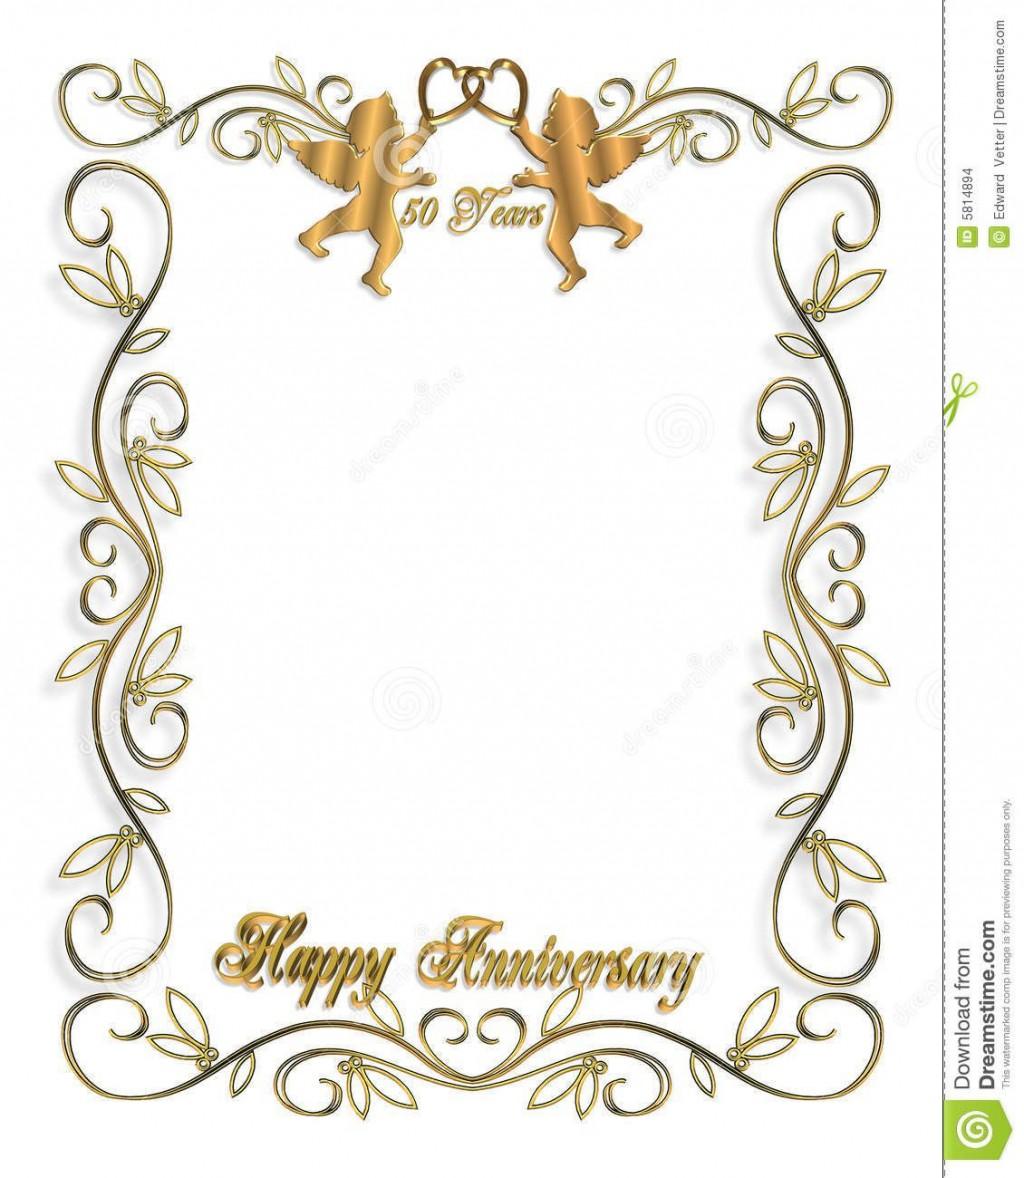 010 Imposing 50th Wedding Anniversary Invitation Template High Resolution  Templates Card Sample GoldenLarge